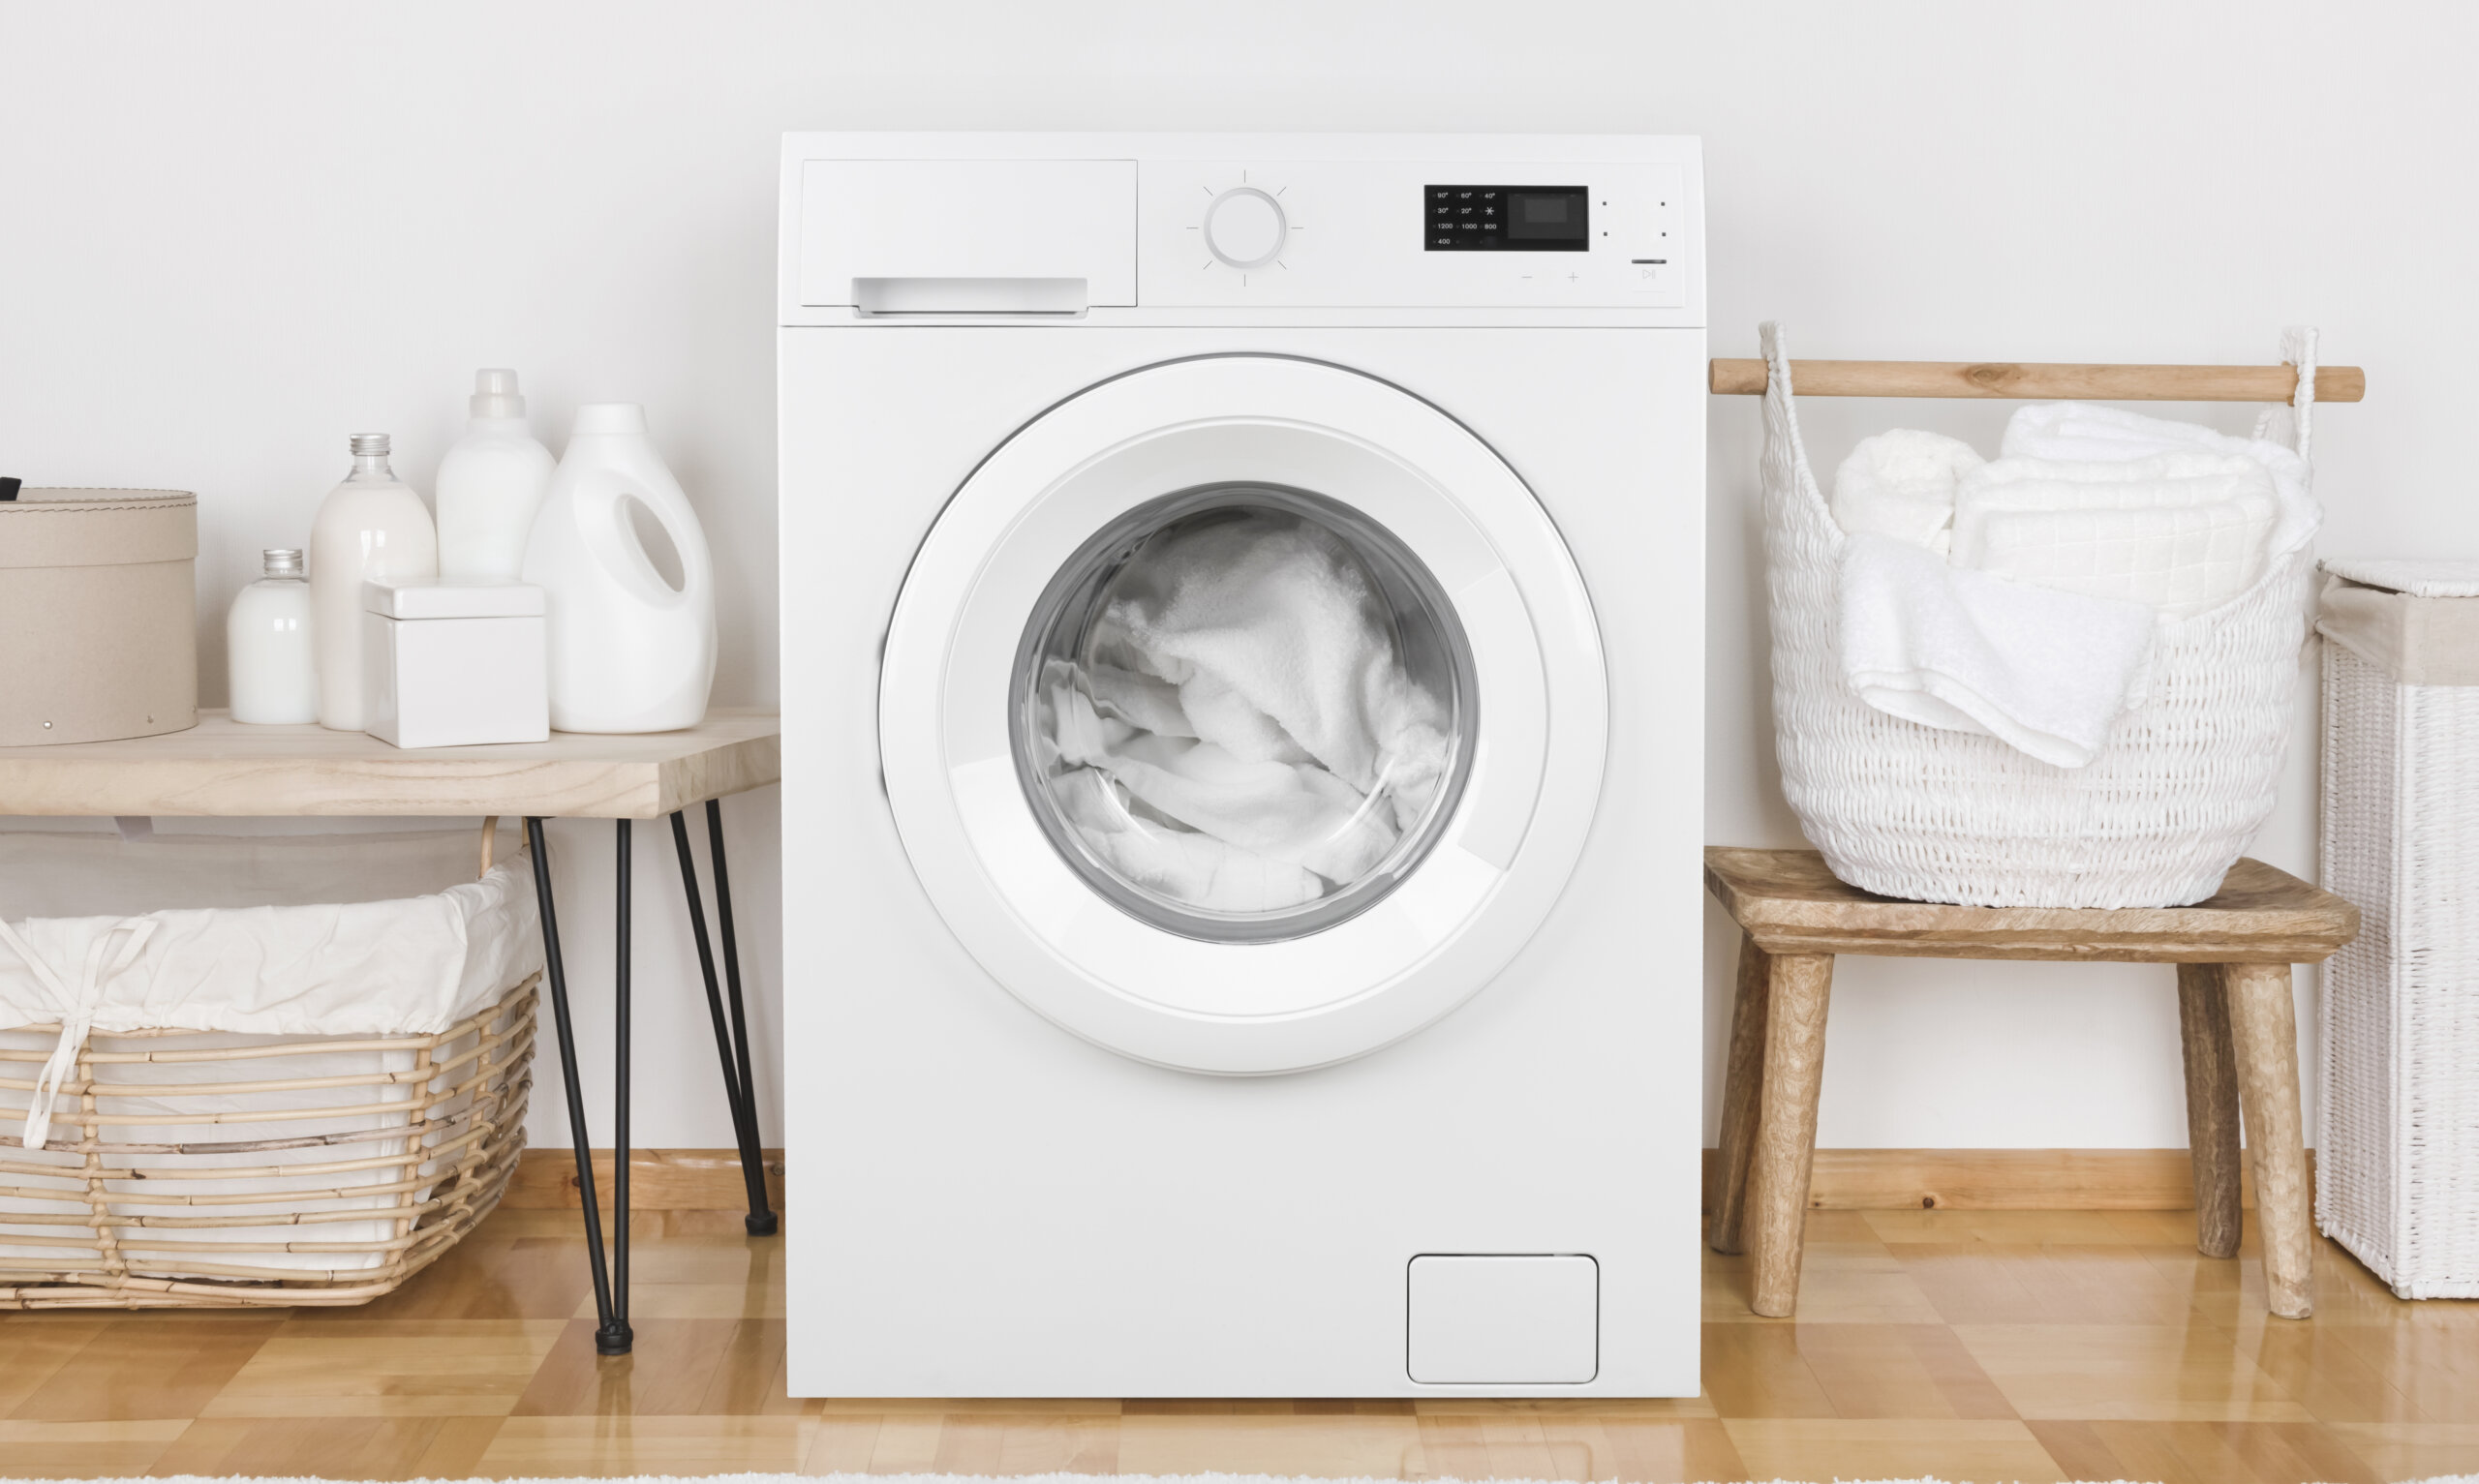 Ciclo máquina de lavar